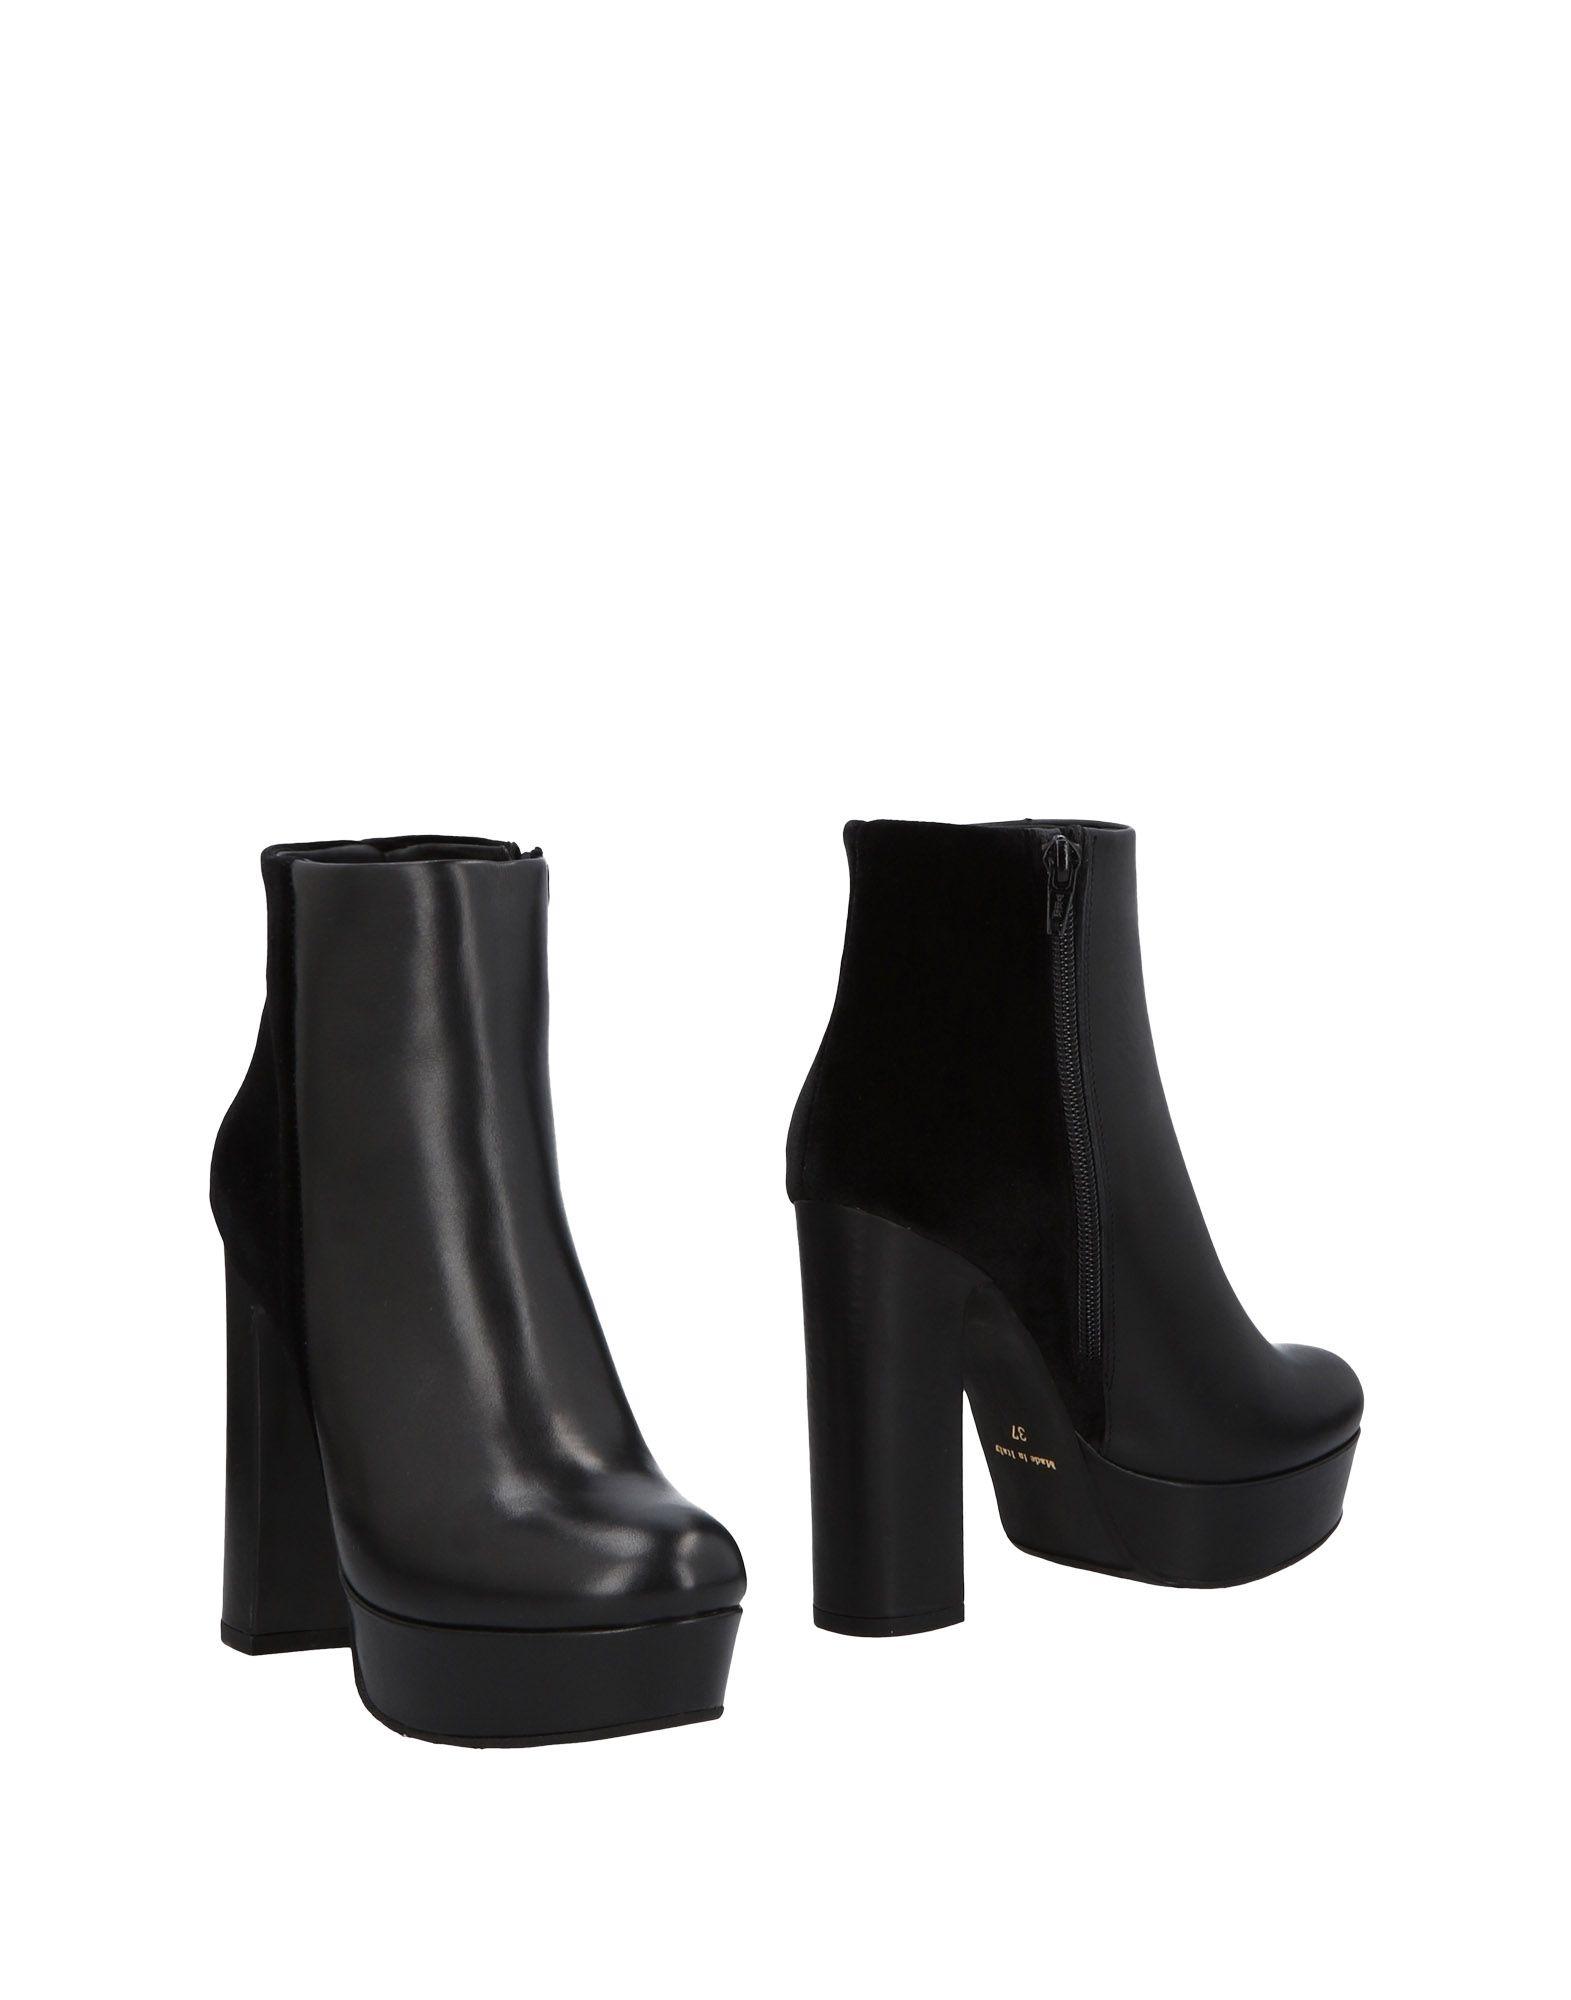 Silvian Heach Ankle Boot - Women Silvian on Heach Ankle Boots online on Silvian  Australia - 11469149DF b0f5d0